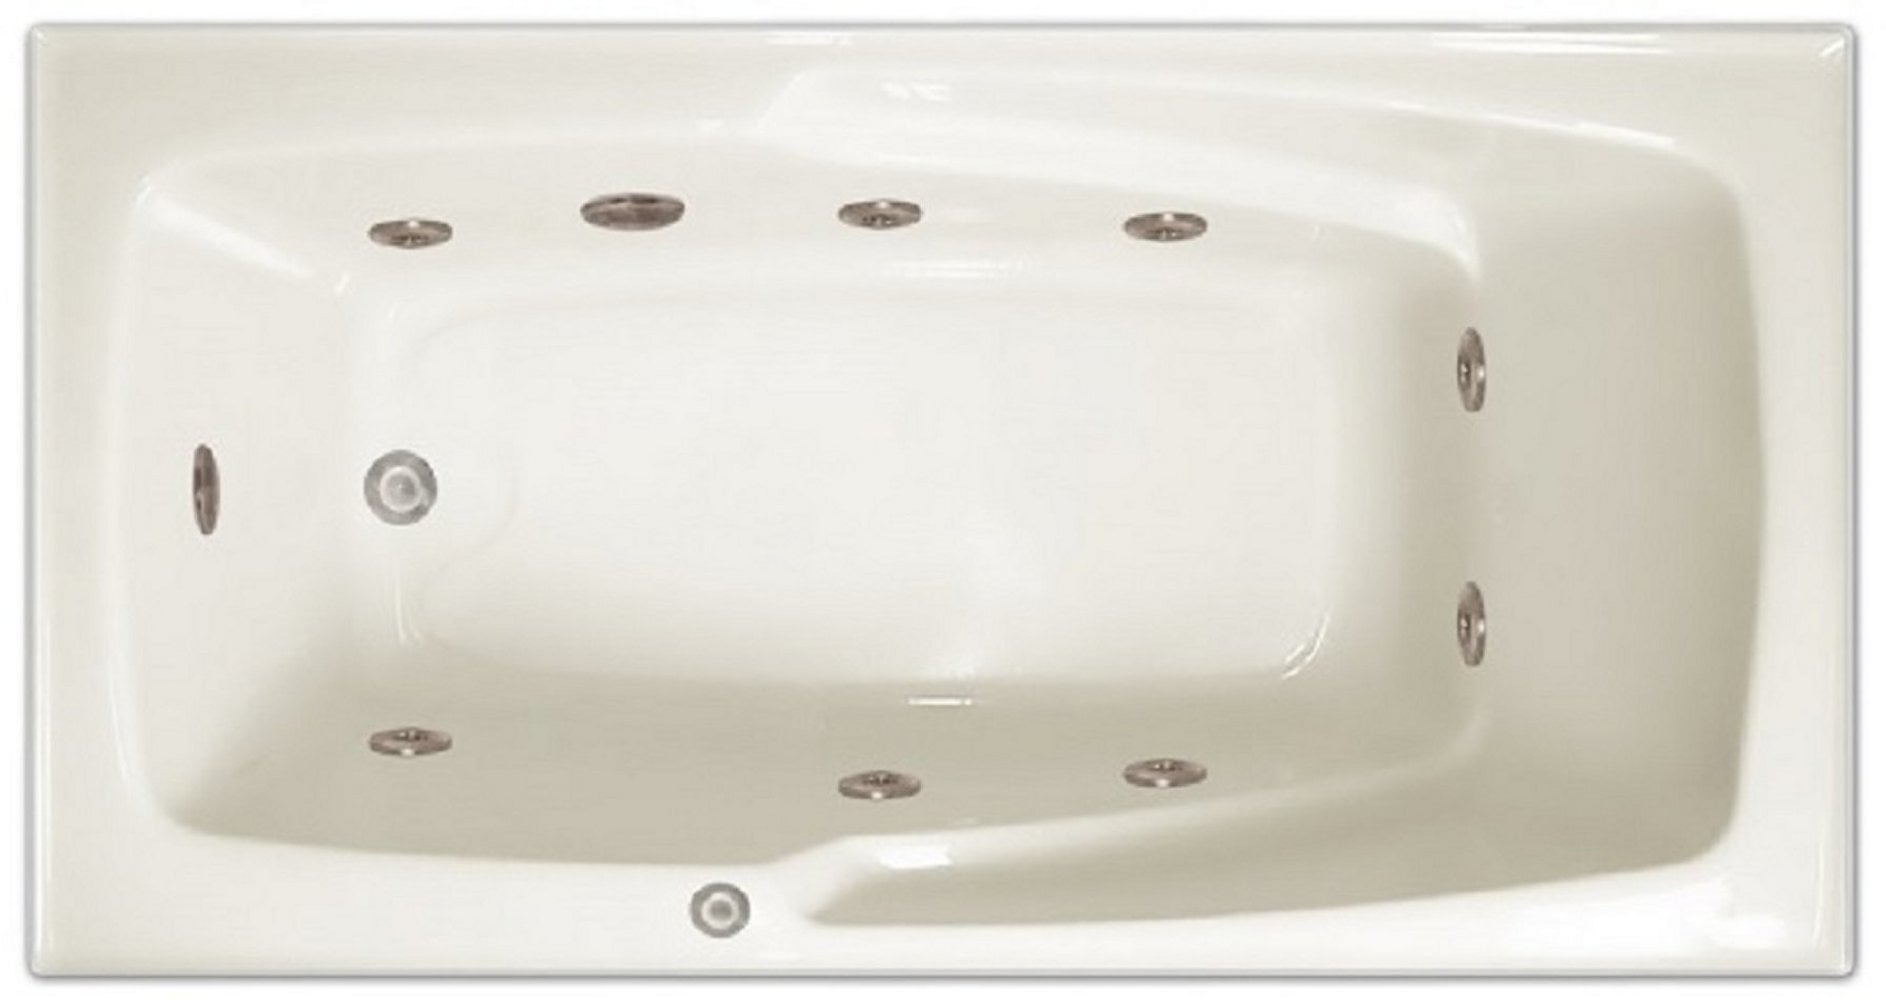 Drop-in Bathtub / 60x32x17.5 / high gloss white acrylic / Rectangle / LPI16-W-LD Pinnacle Bath - Whirlpool 0